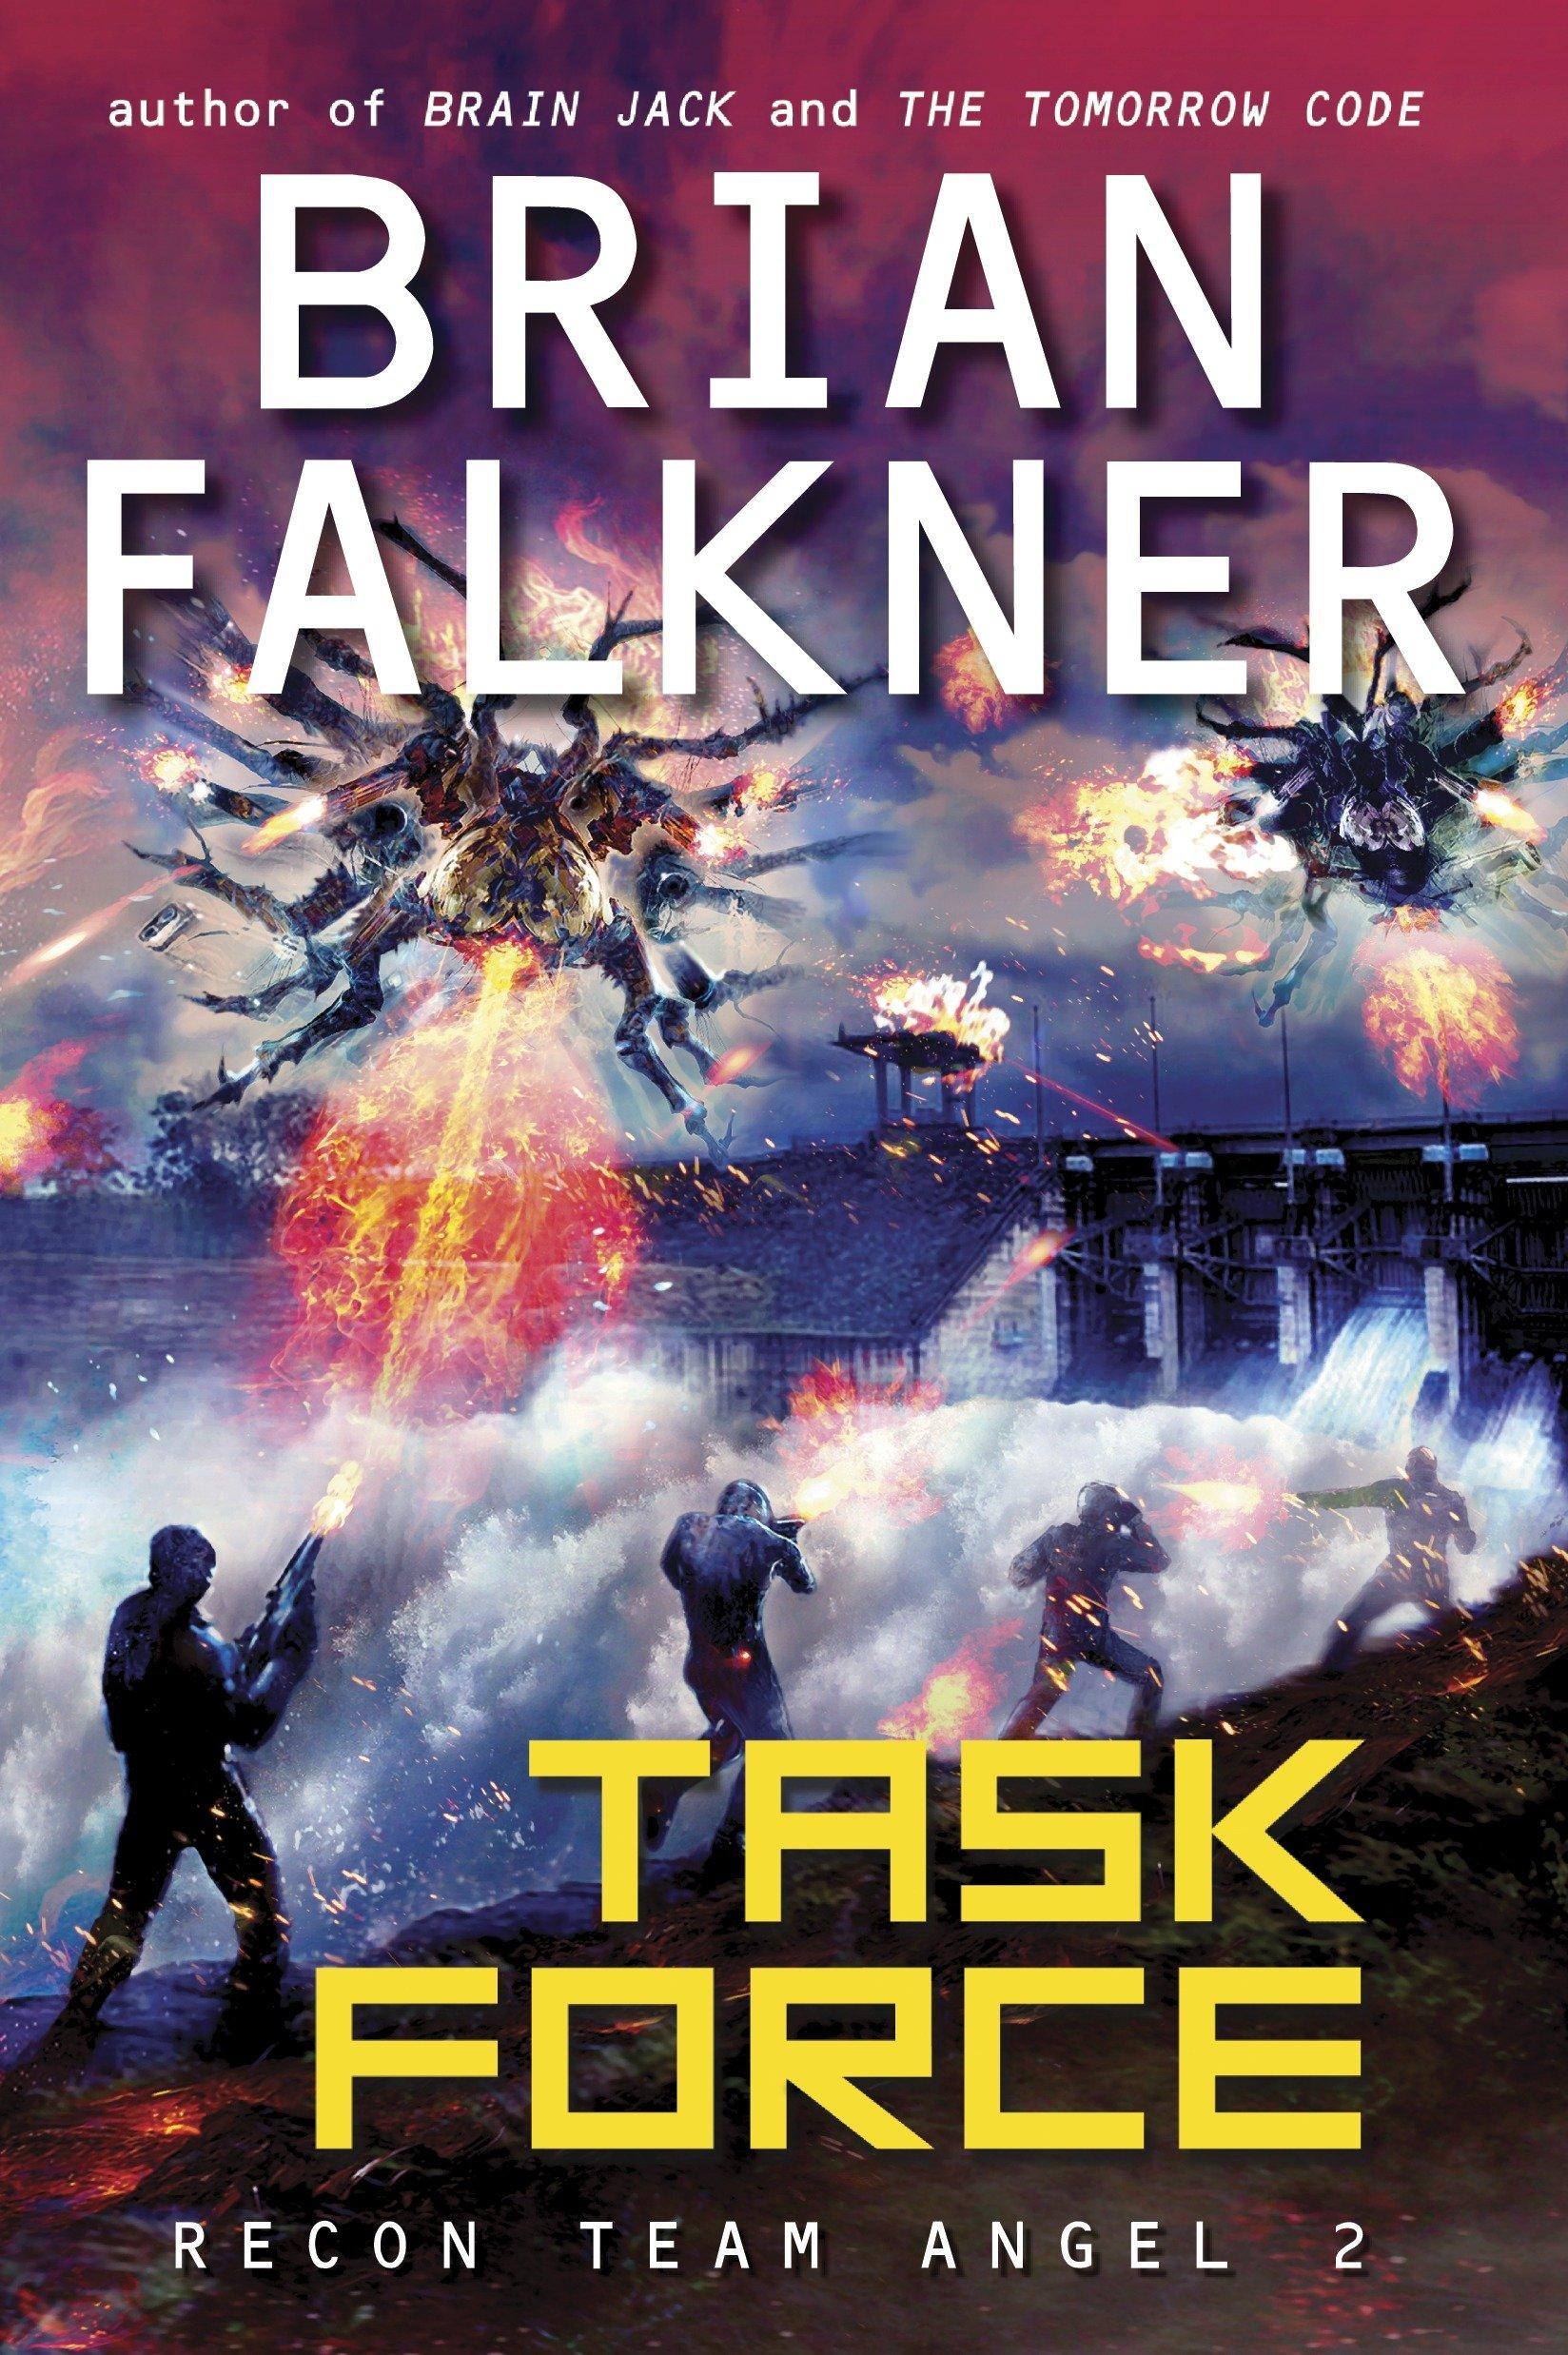 Download Task Force (Recon Team Angel #2) ebook